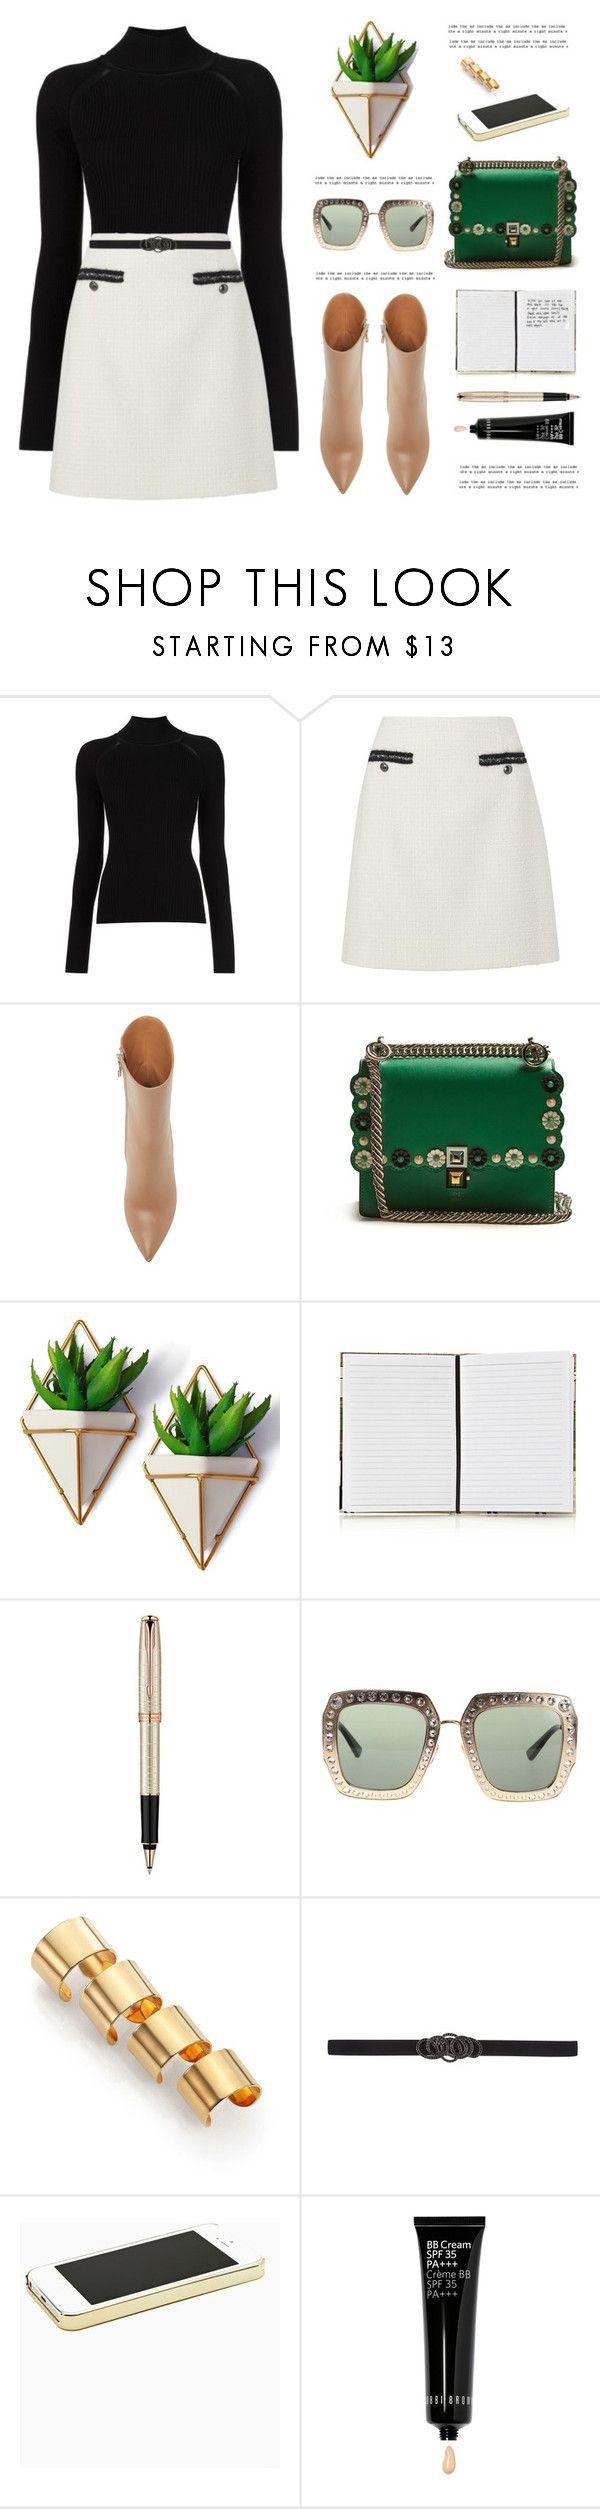 """OOTD"" by yexyka ❤ liked on Polyvore featuring Misha Nonoo, Fendi, Harrods, Parker, Gucci, Maison Margiela, Oscar de la Renta, Bobbi Brown Cosmetics and emeraldgreen"